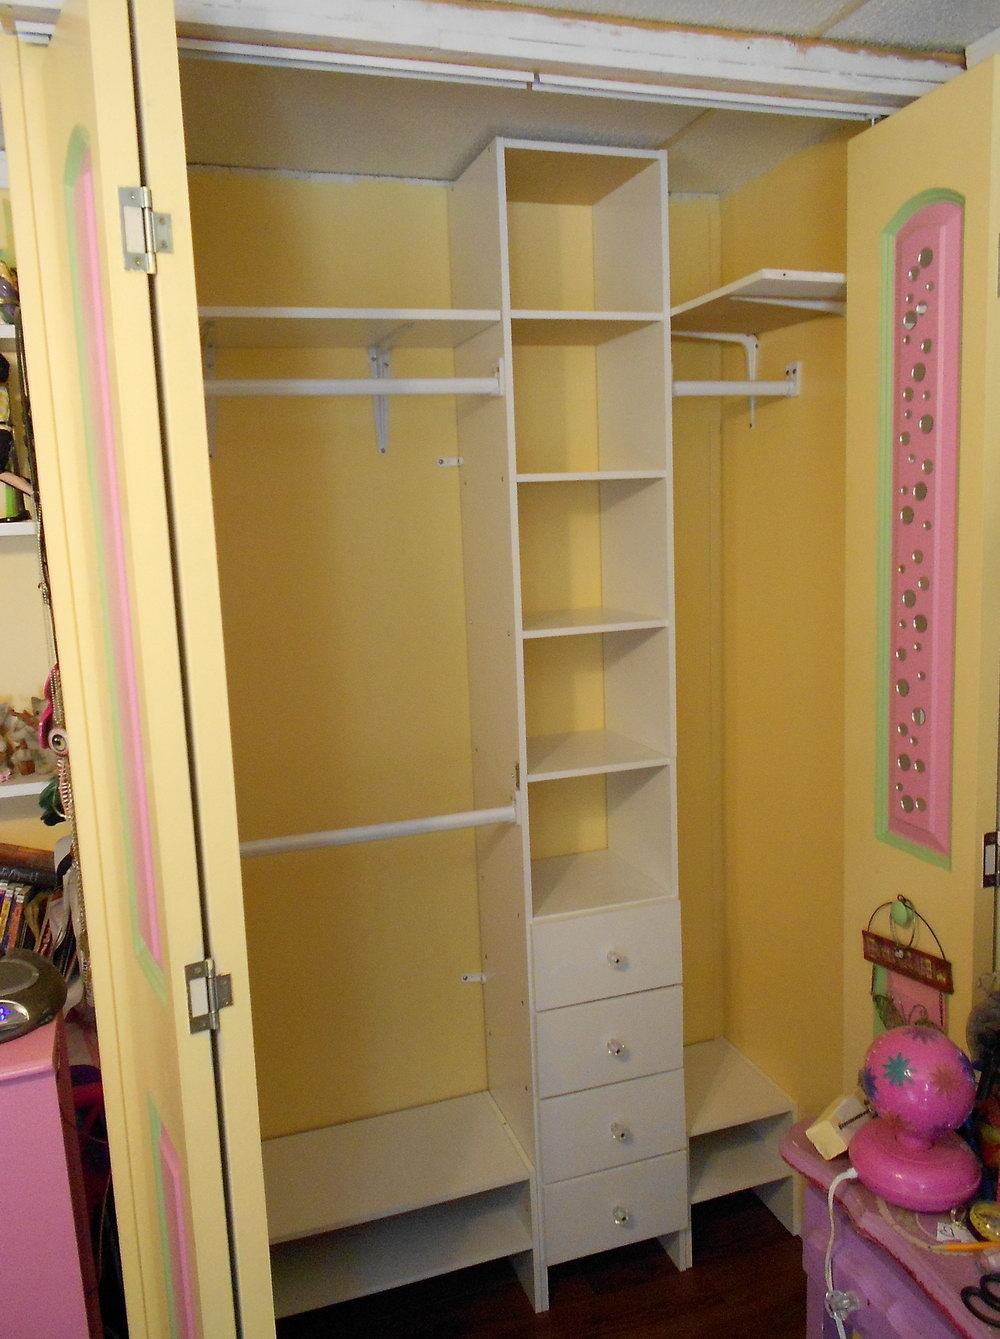 Home Depot Closet Organizers Installation